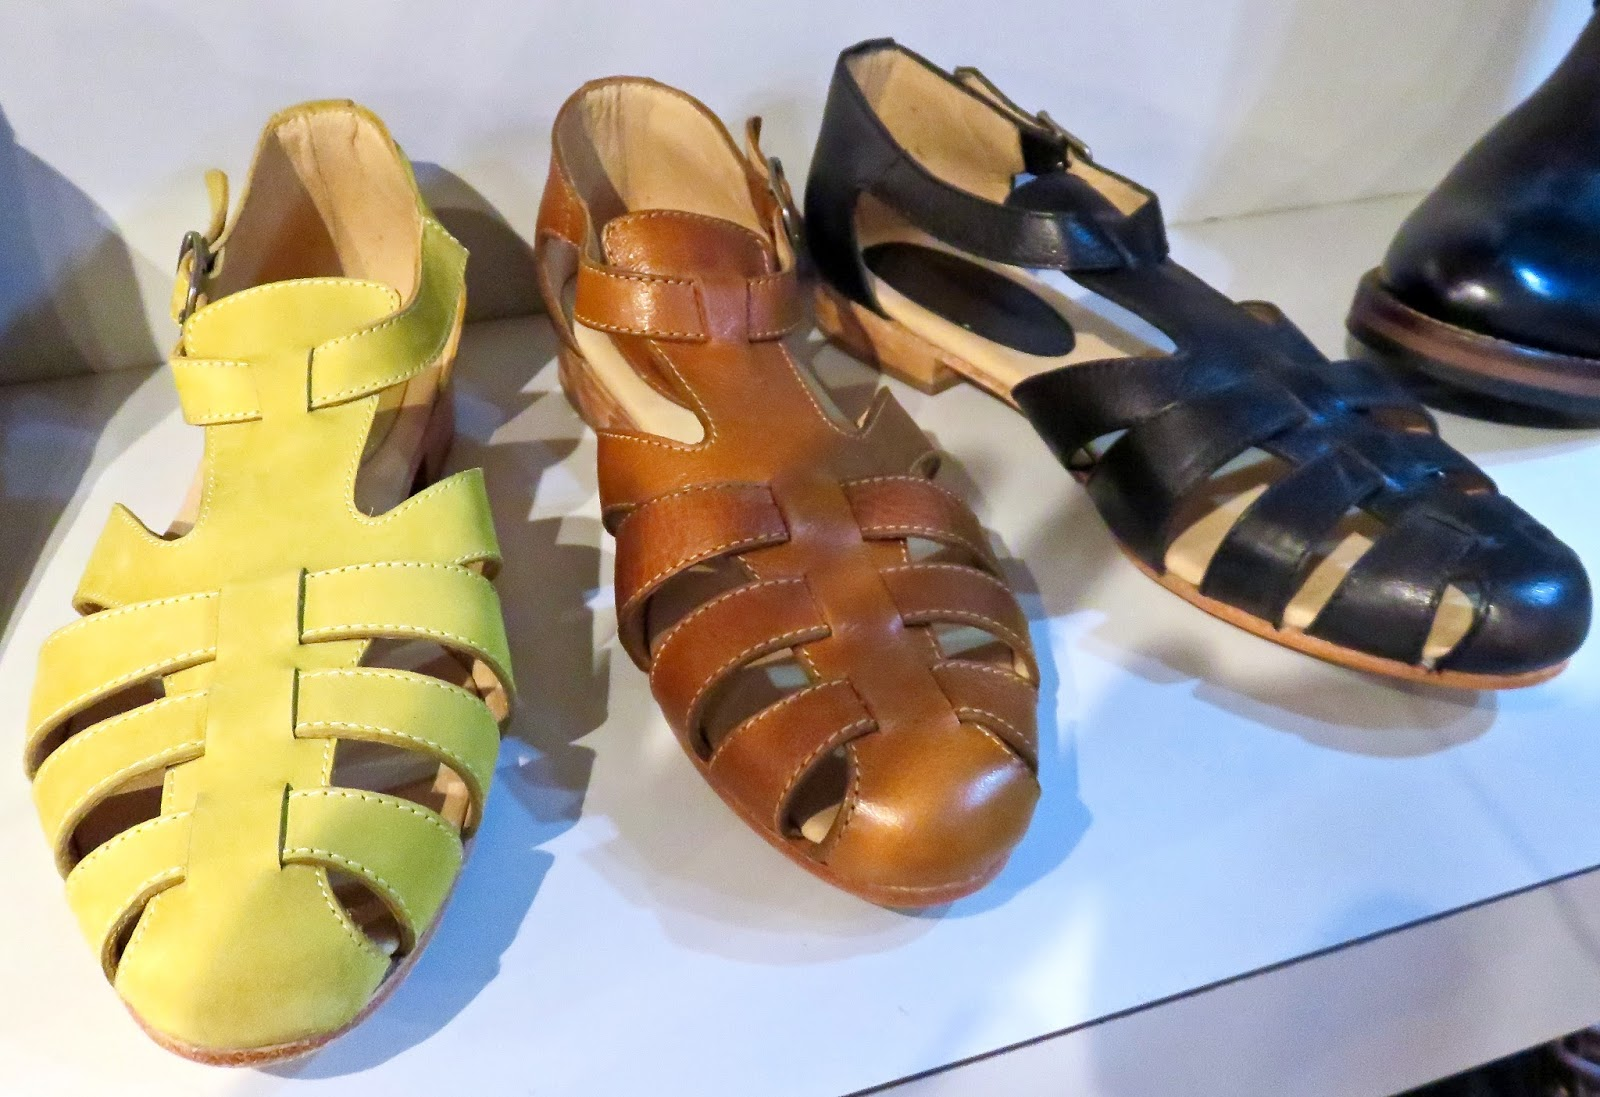 0ebbdf175d149 Fisherman sandals get feminine take-FRIEDA full grain nubuck  leather...lightweight 6.10 oz---in cream